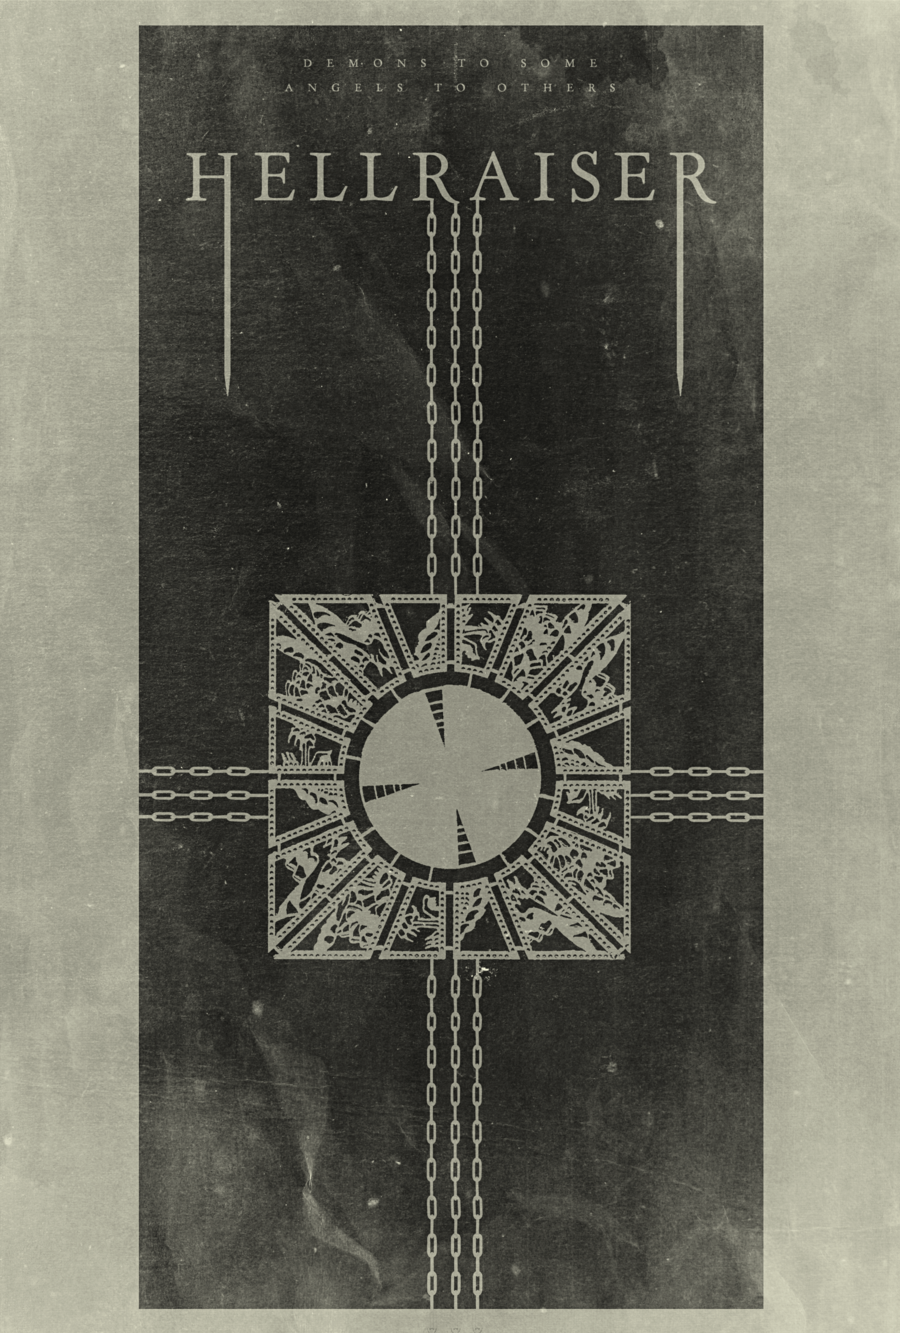 Jesus Wept Hellraiser Poster by disgorgeapocalypseviantart